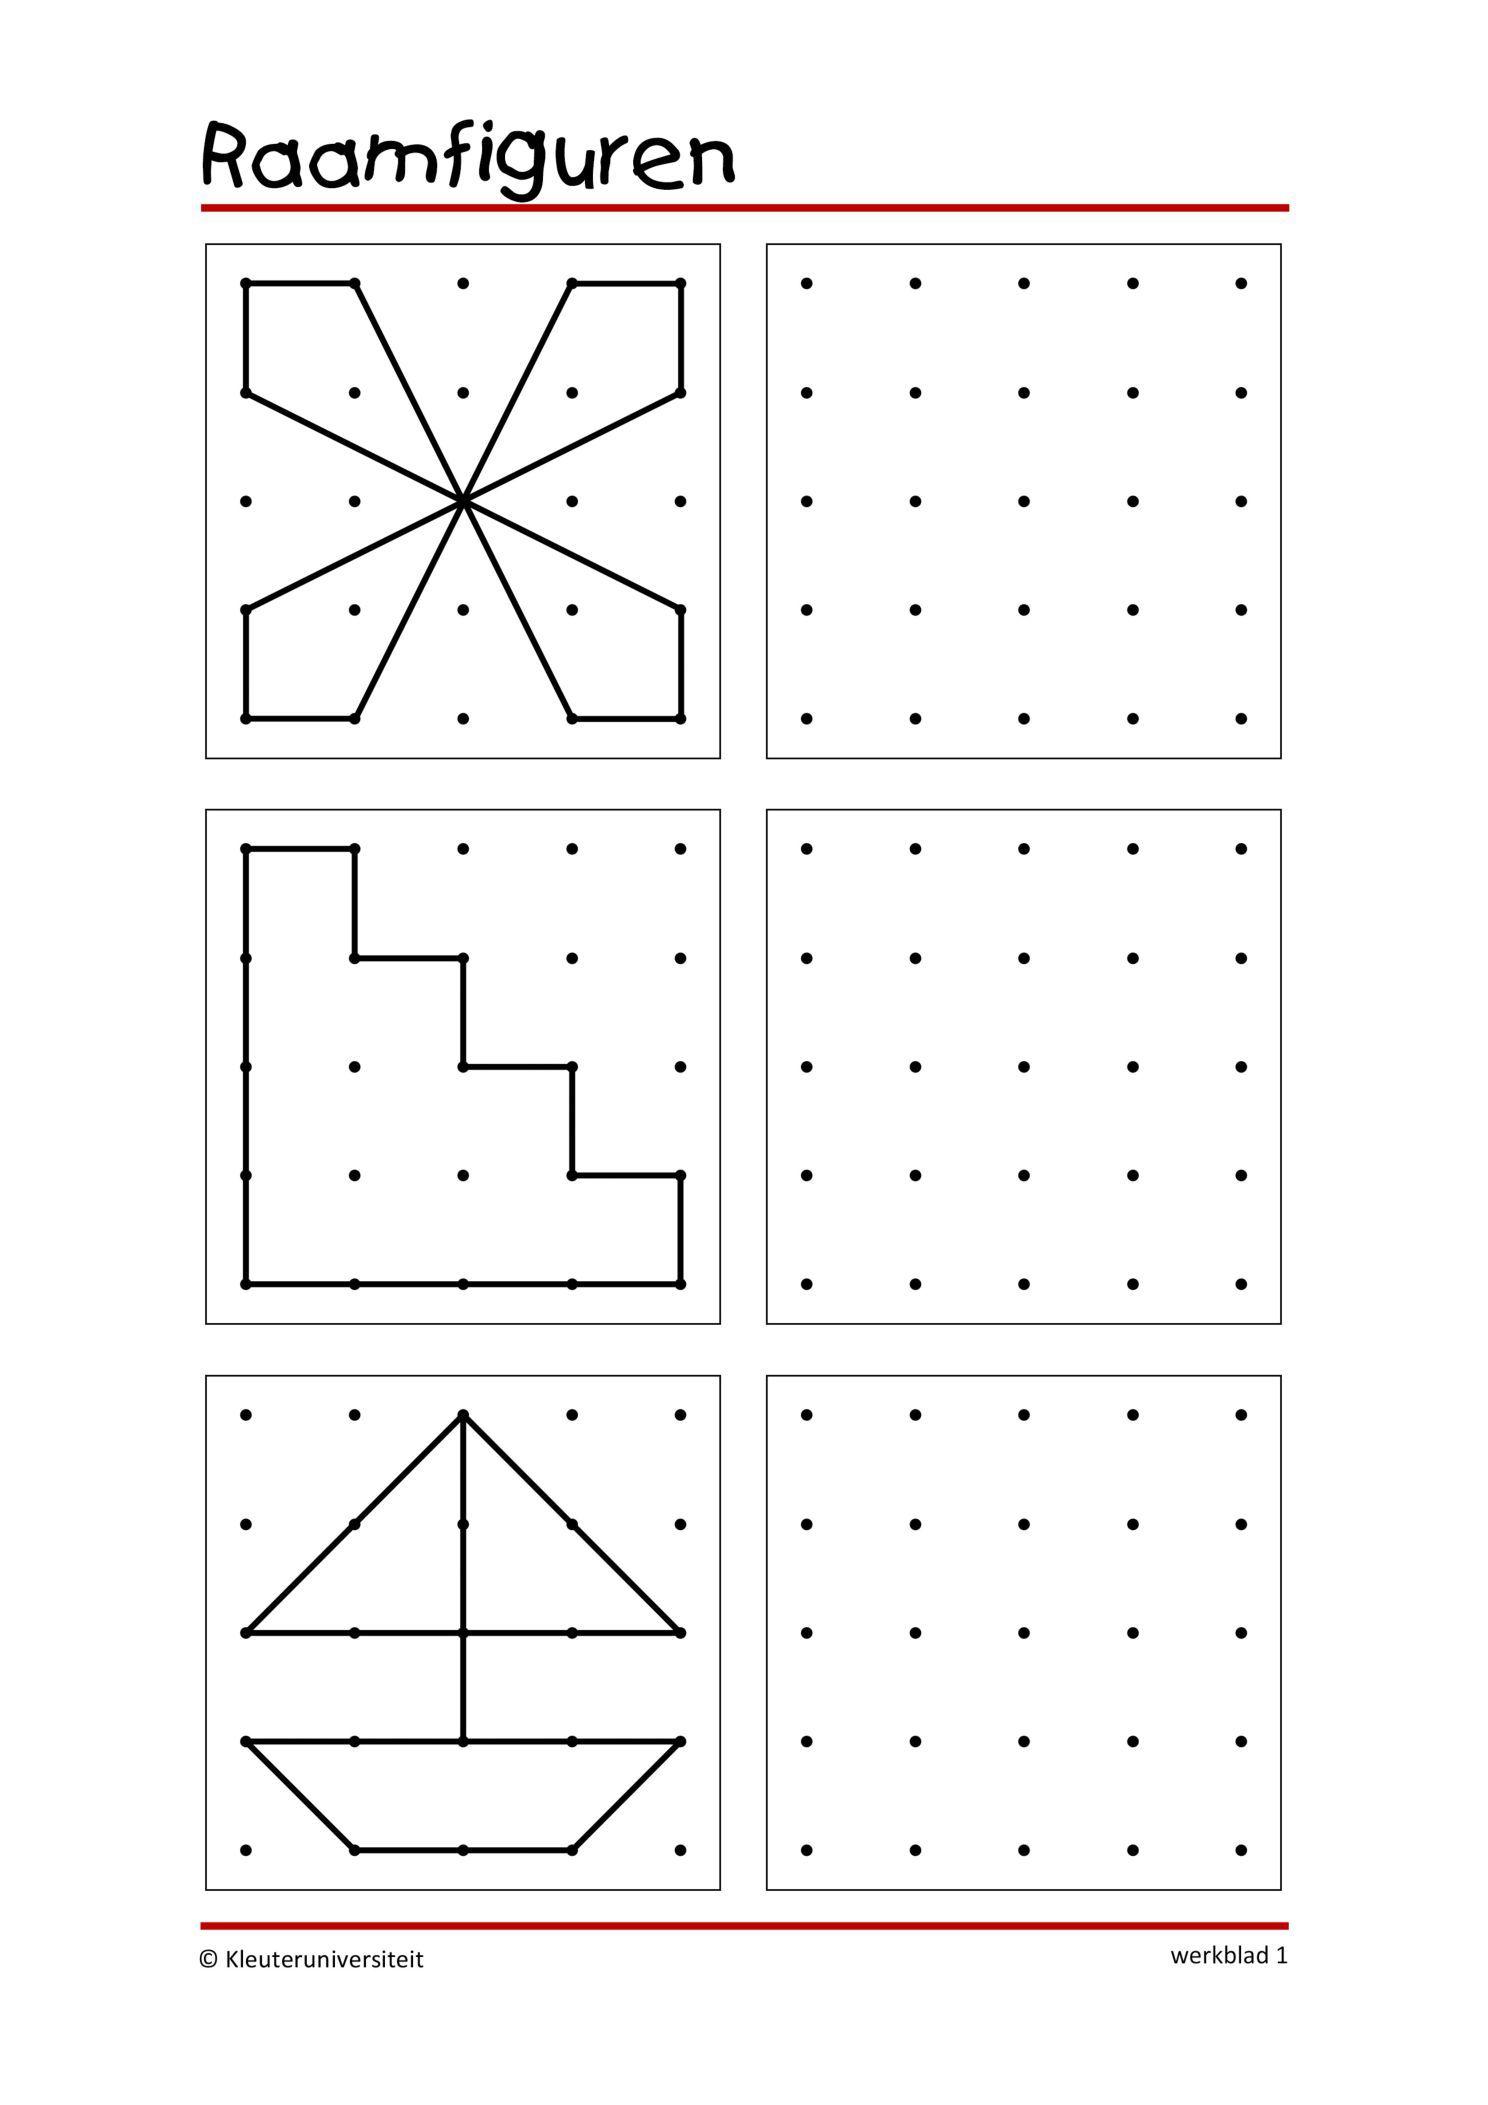 unir punts | ATENCIÓ | Pinterest | Vorschule, Mathe und Arbeitsblätter